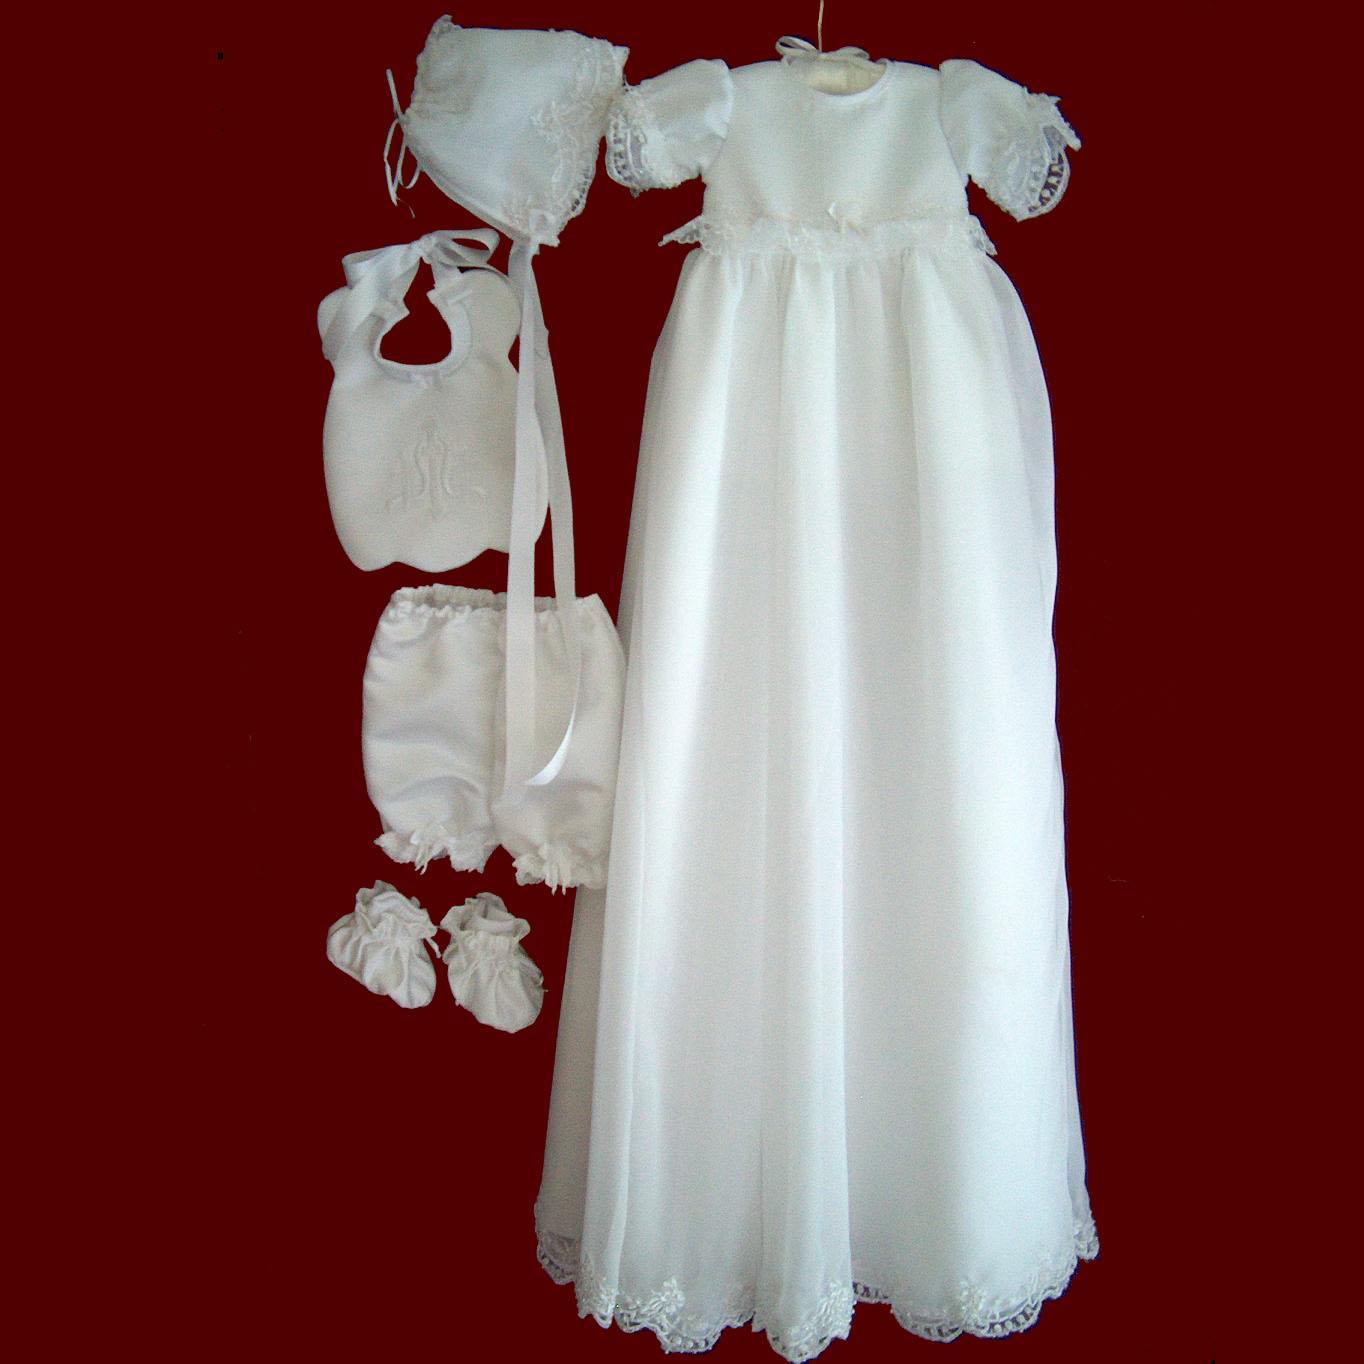 43cbefd9482c Christening Gown Made From Your Wedding Dress - Irish Girls ...